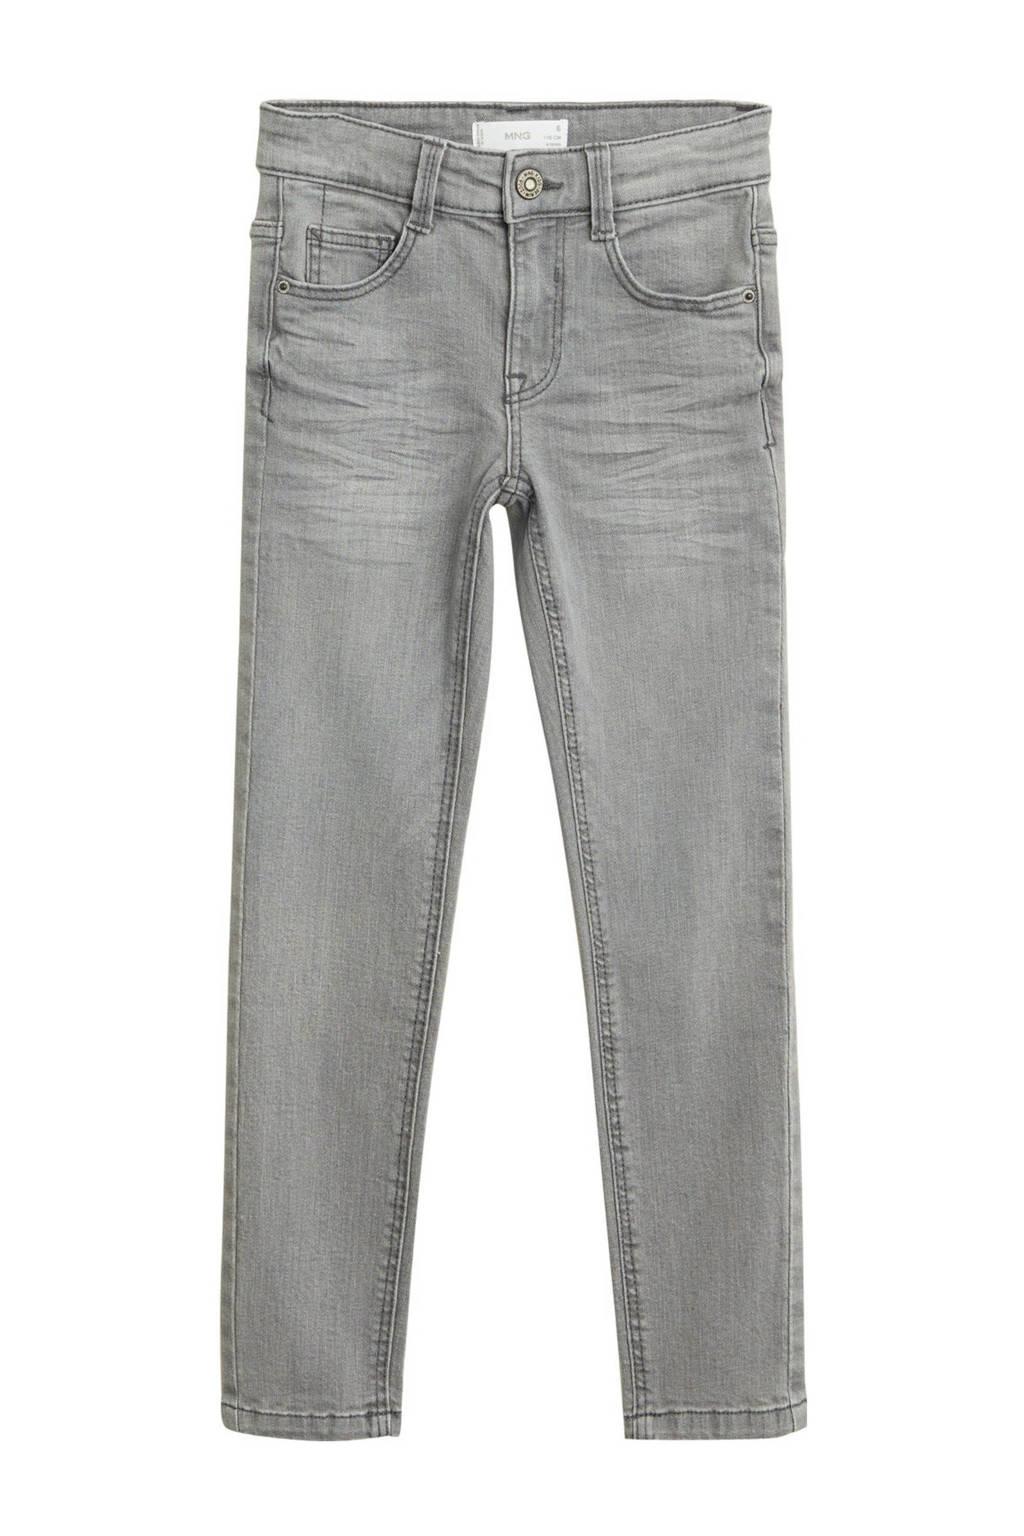 Mango Kids slim fit jeans grijs, Grijs